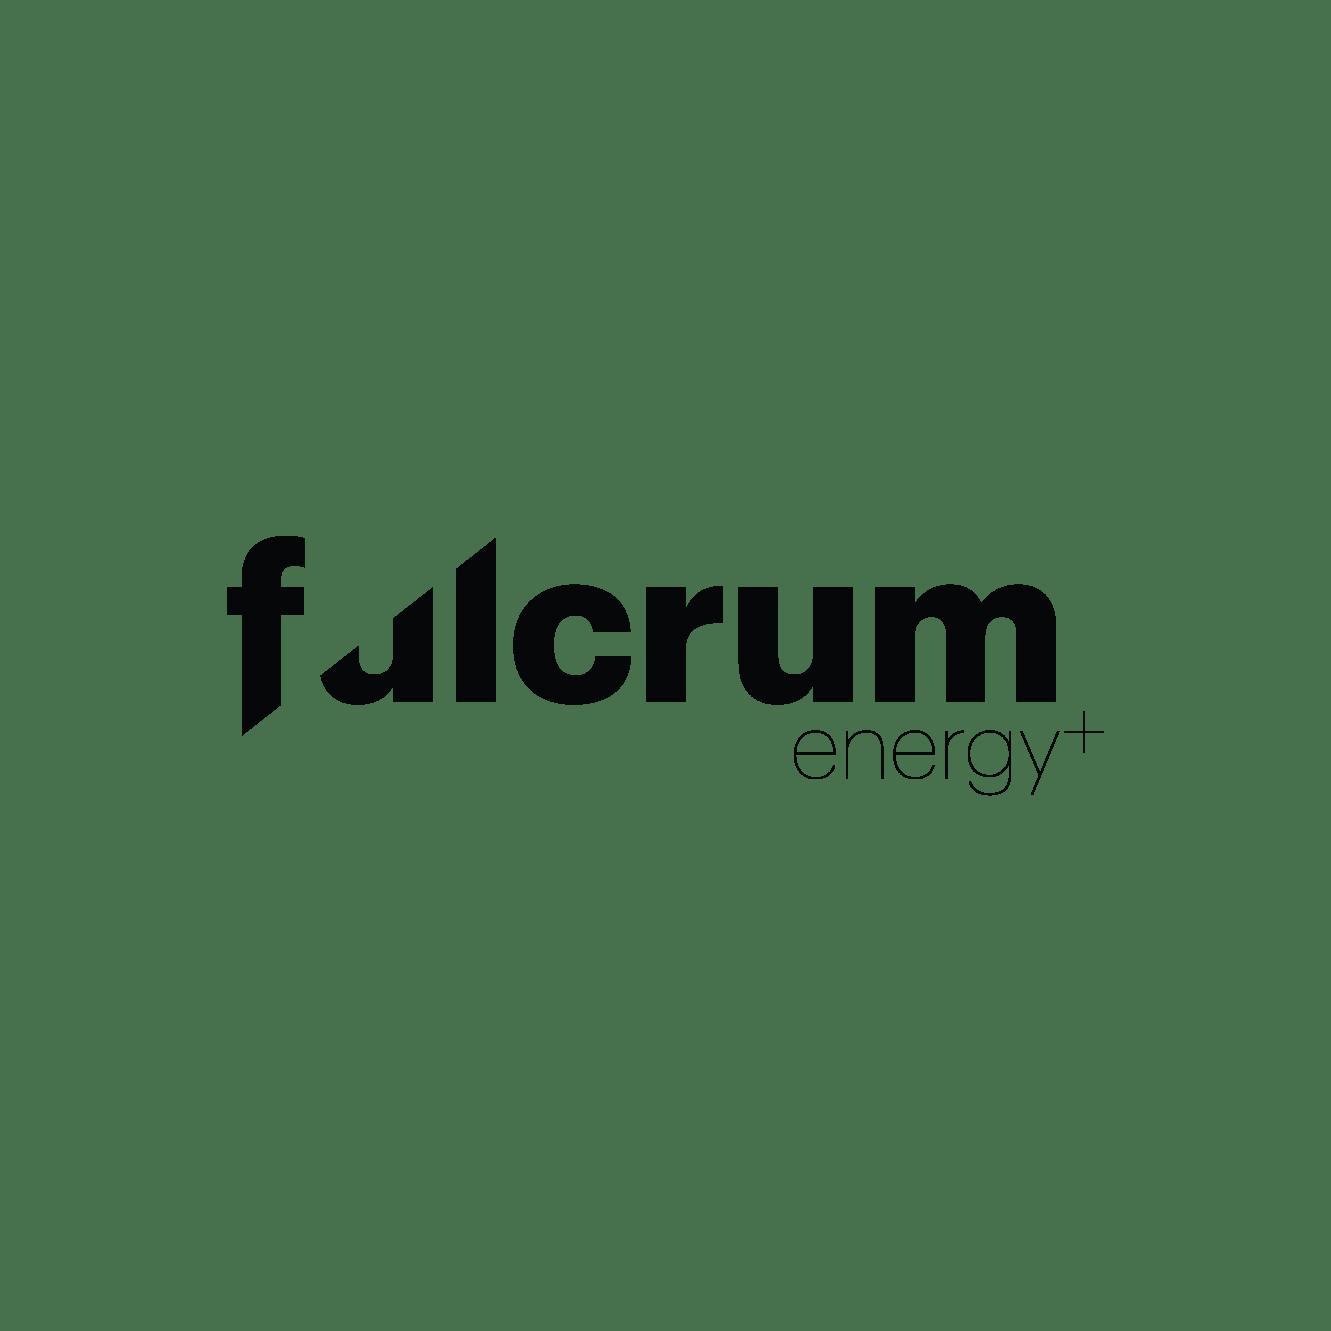 fulcrum_logosinitialselects_020419-24